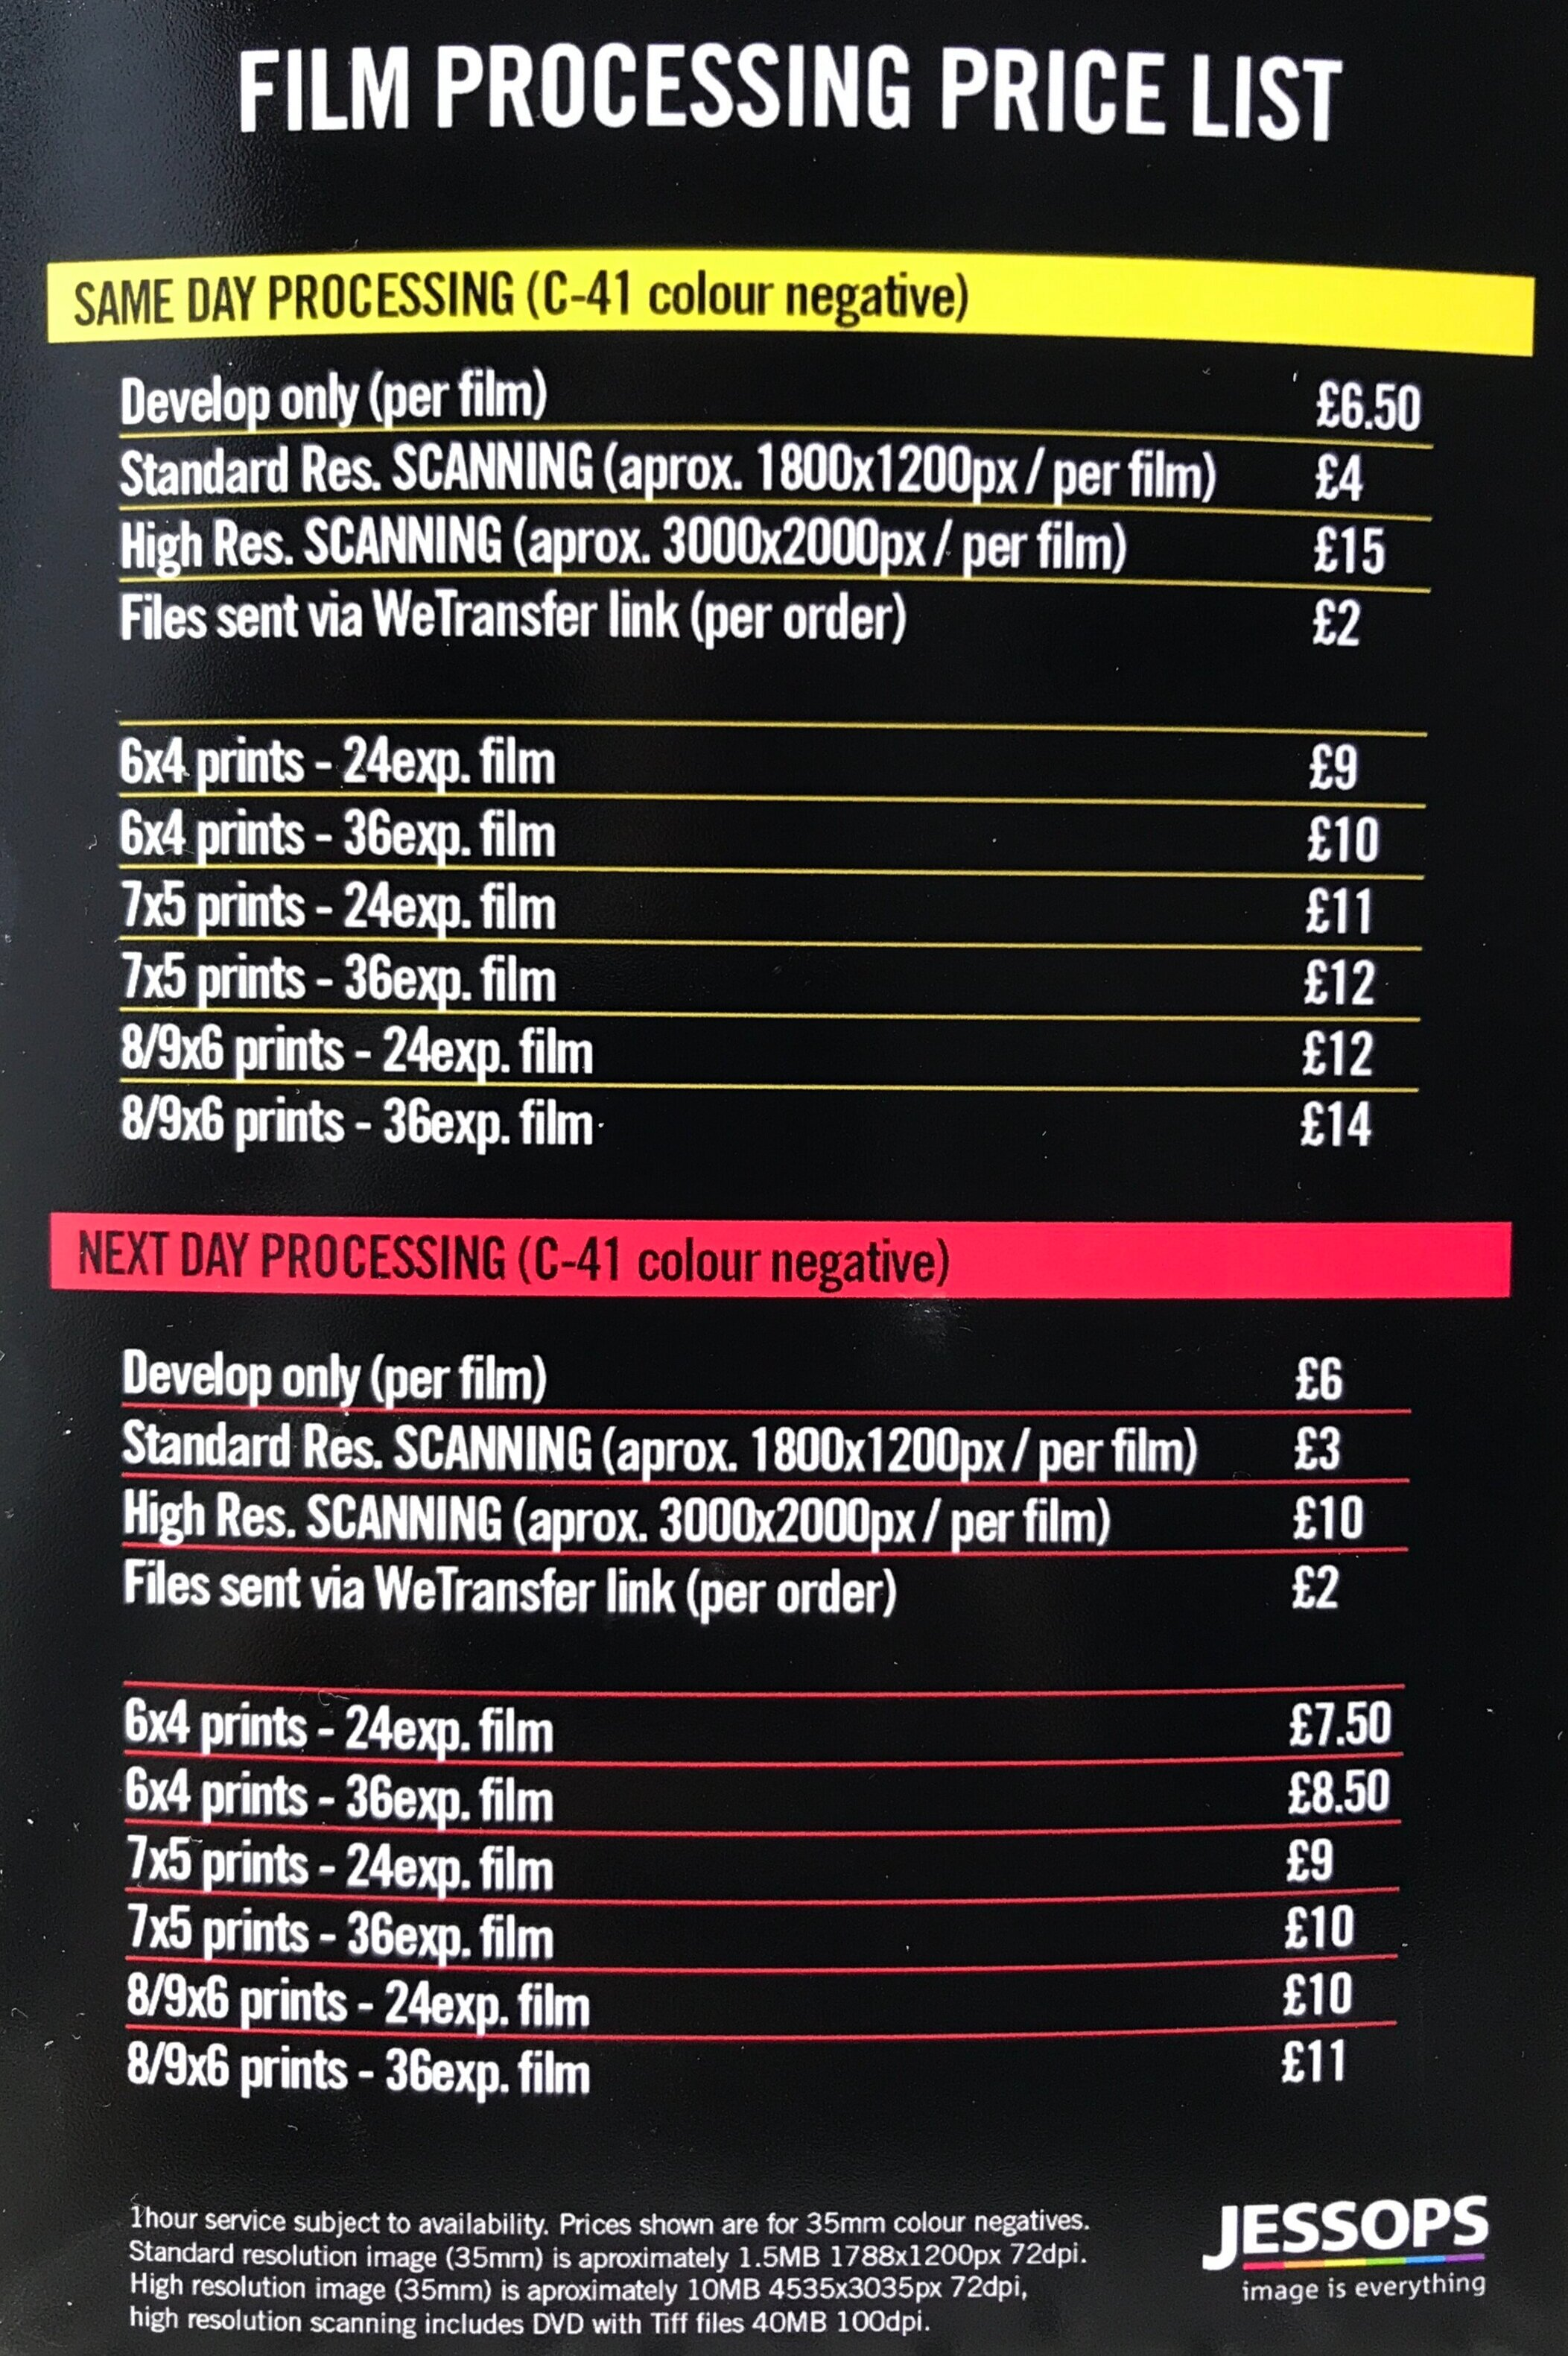 Jessops in-store film processing price list.